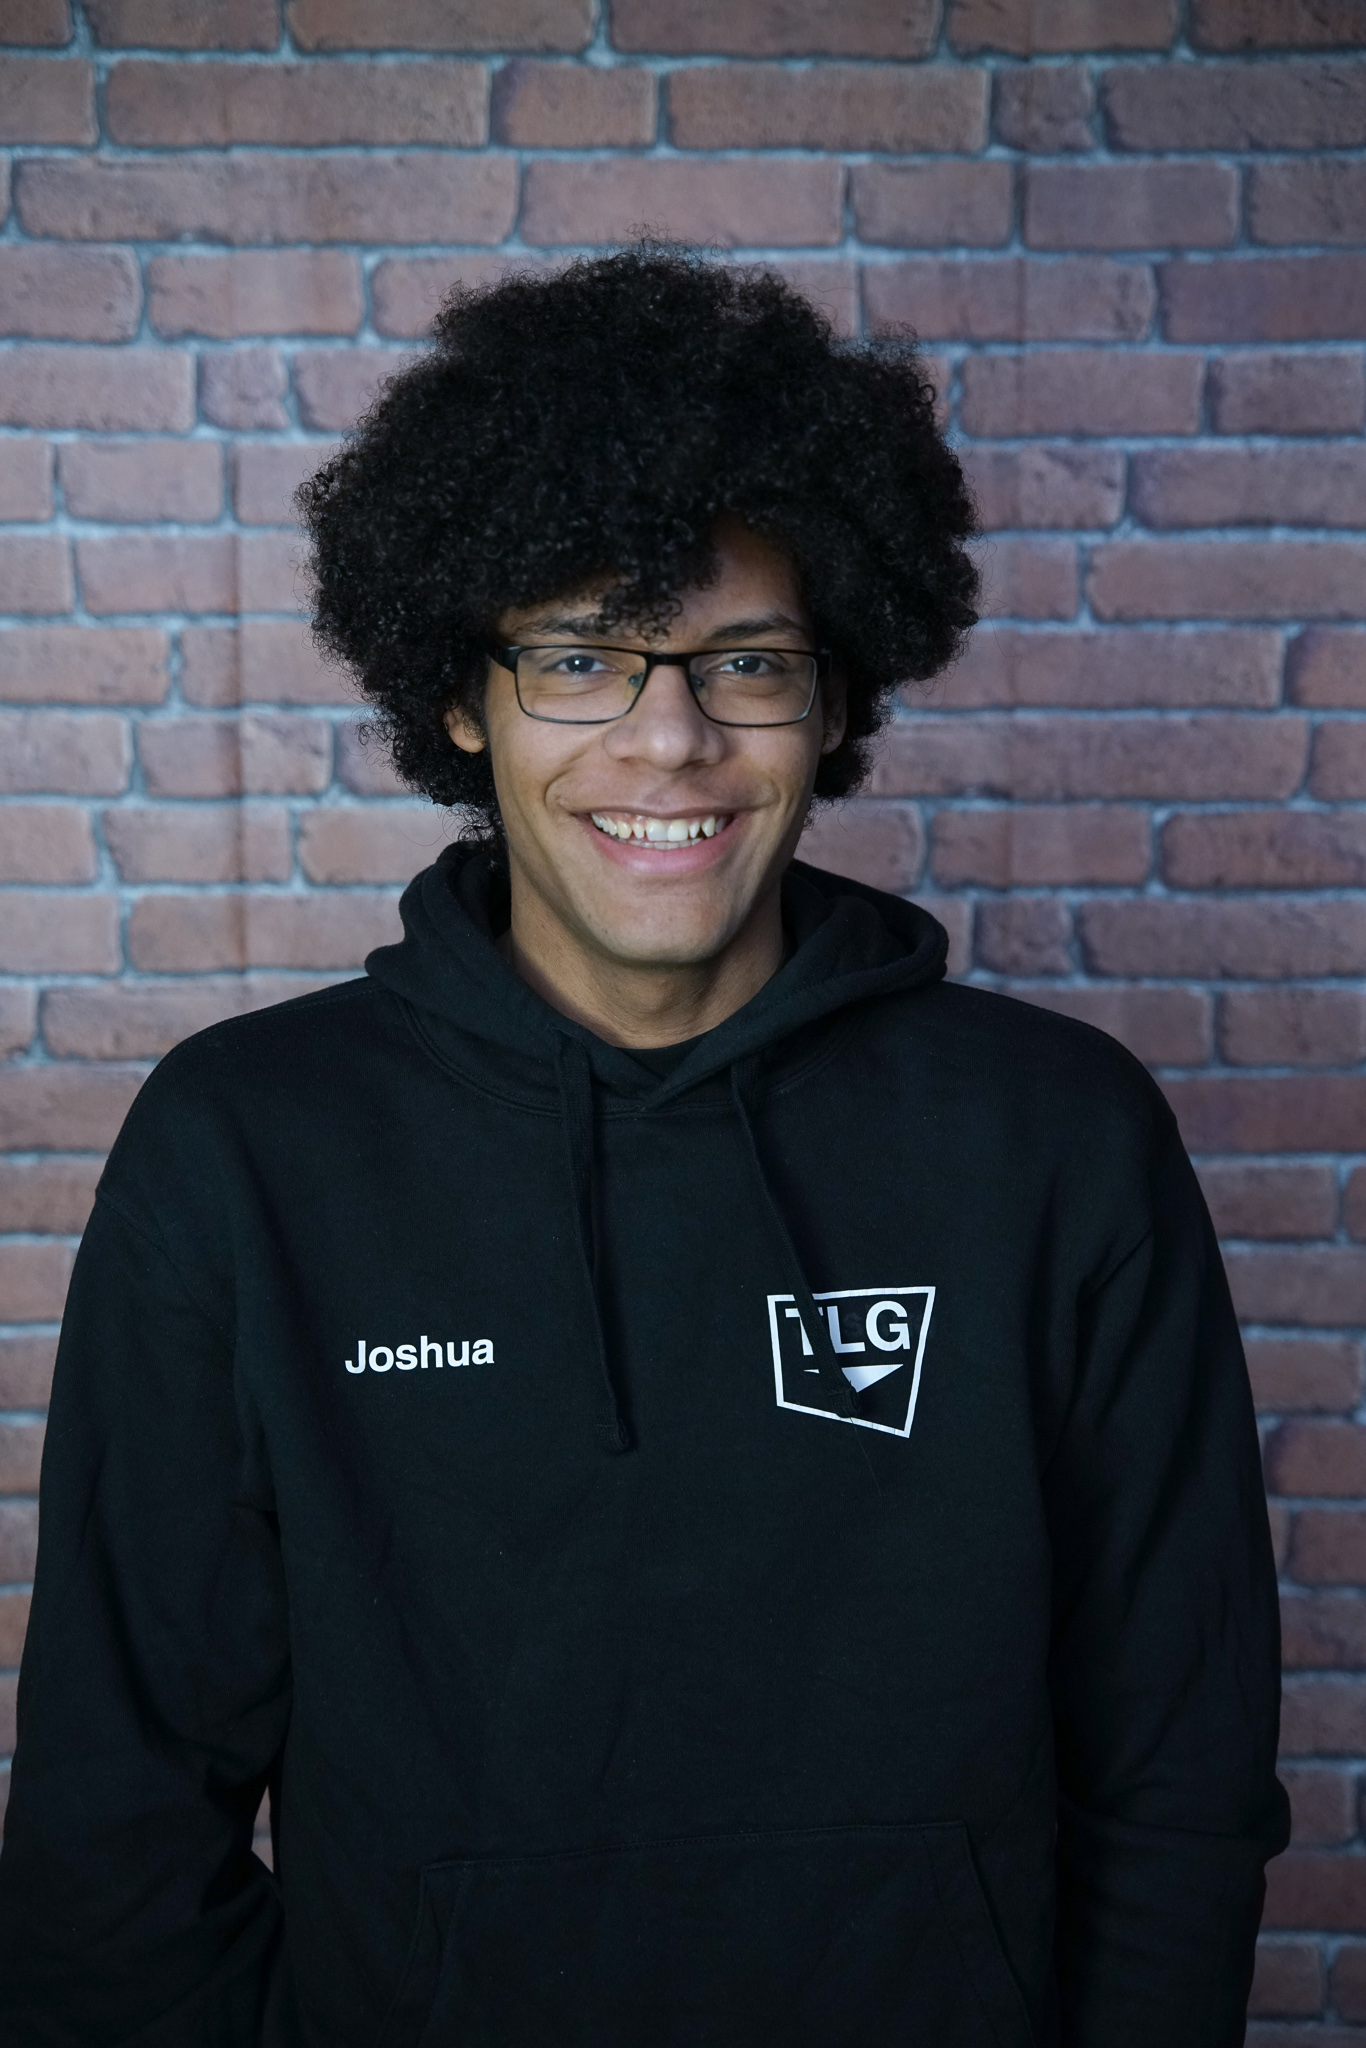 Joshua Obinna